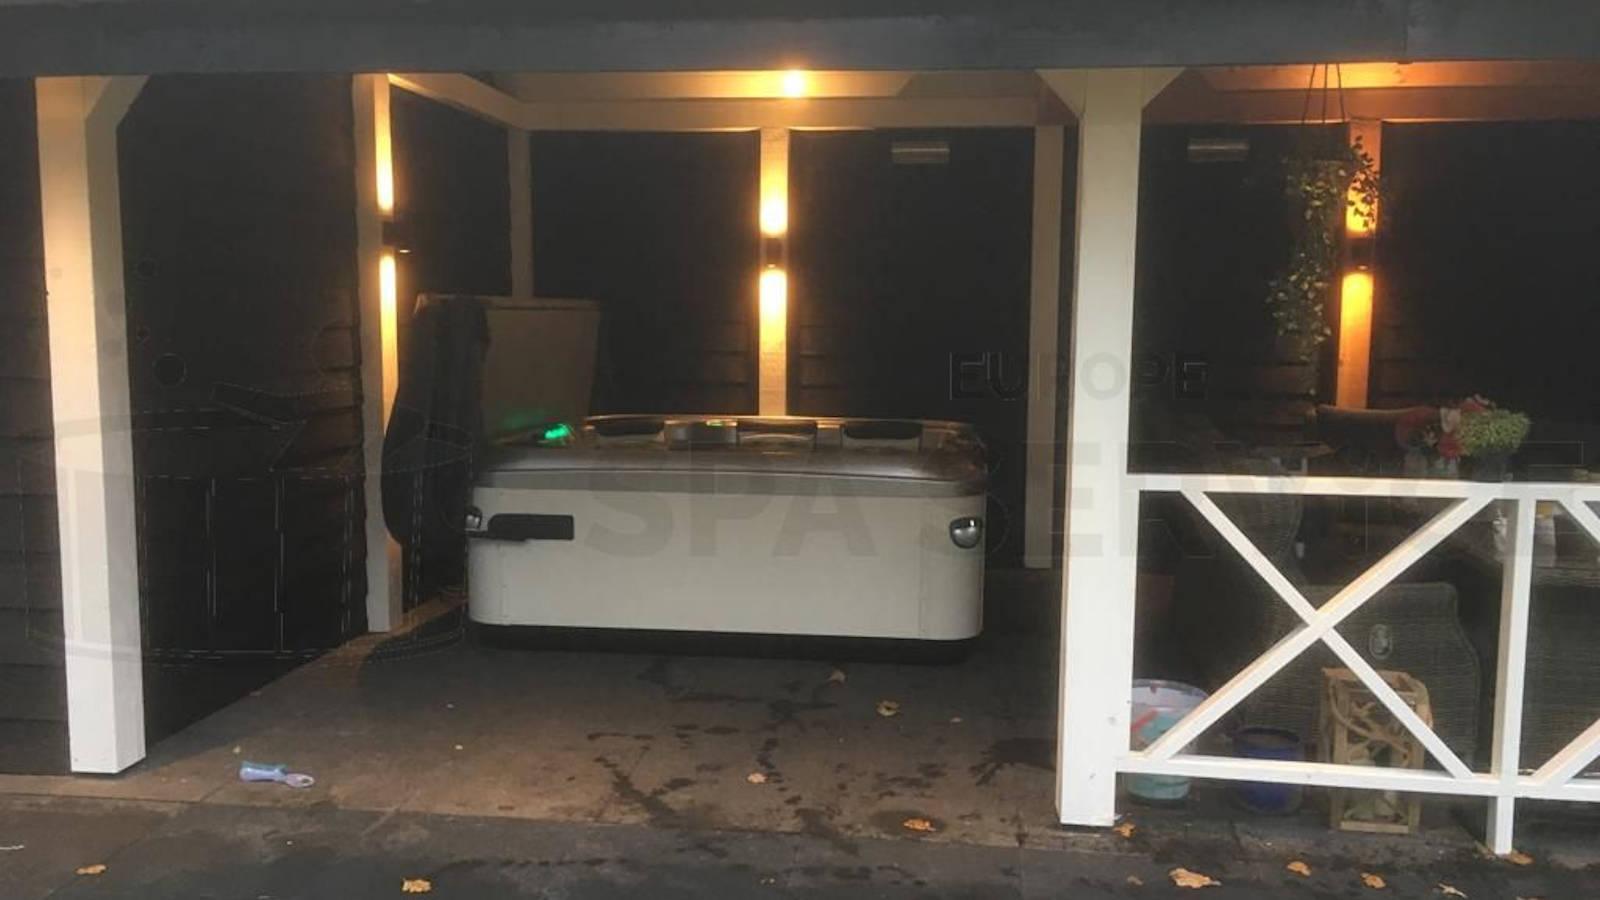 Plaatsing van een Villeroy & Boch A6L spa in Nunspeet